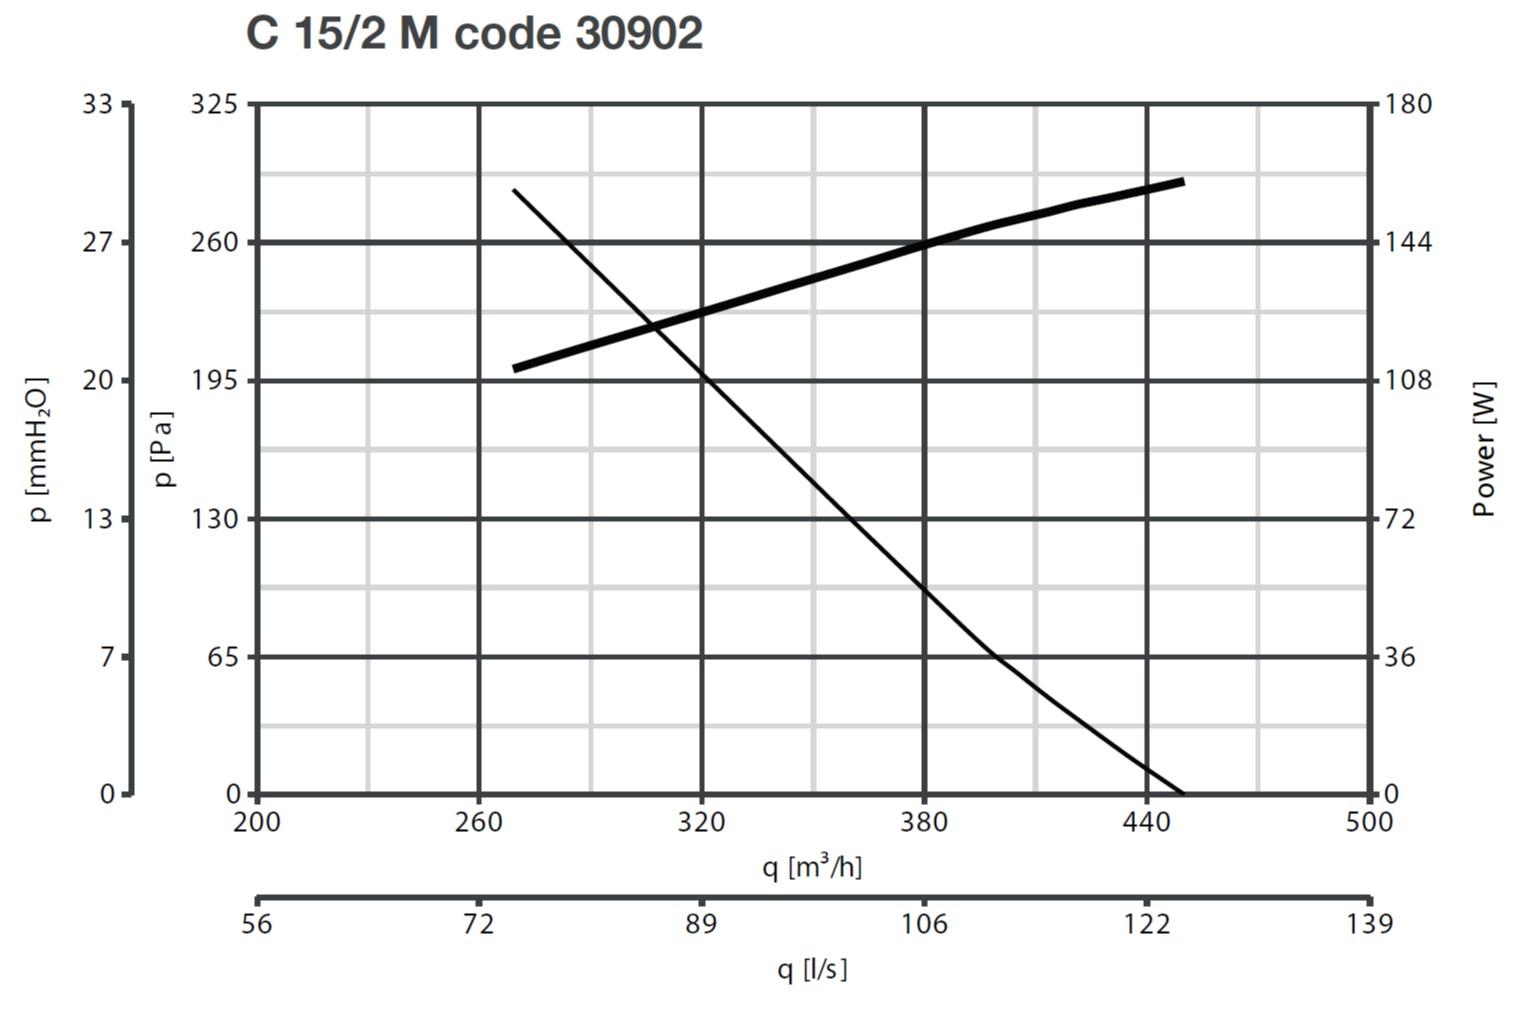 Curba caracteristica ventilator centrifugal Vorticent C 15/2 M